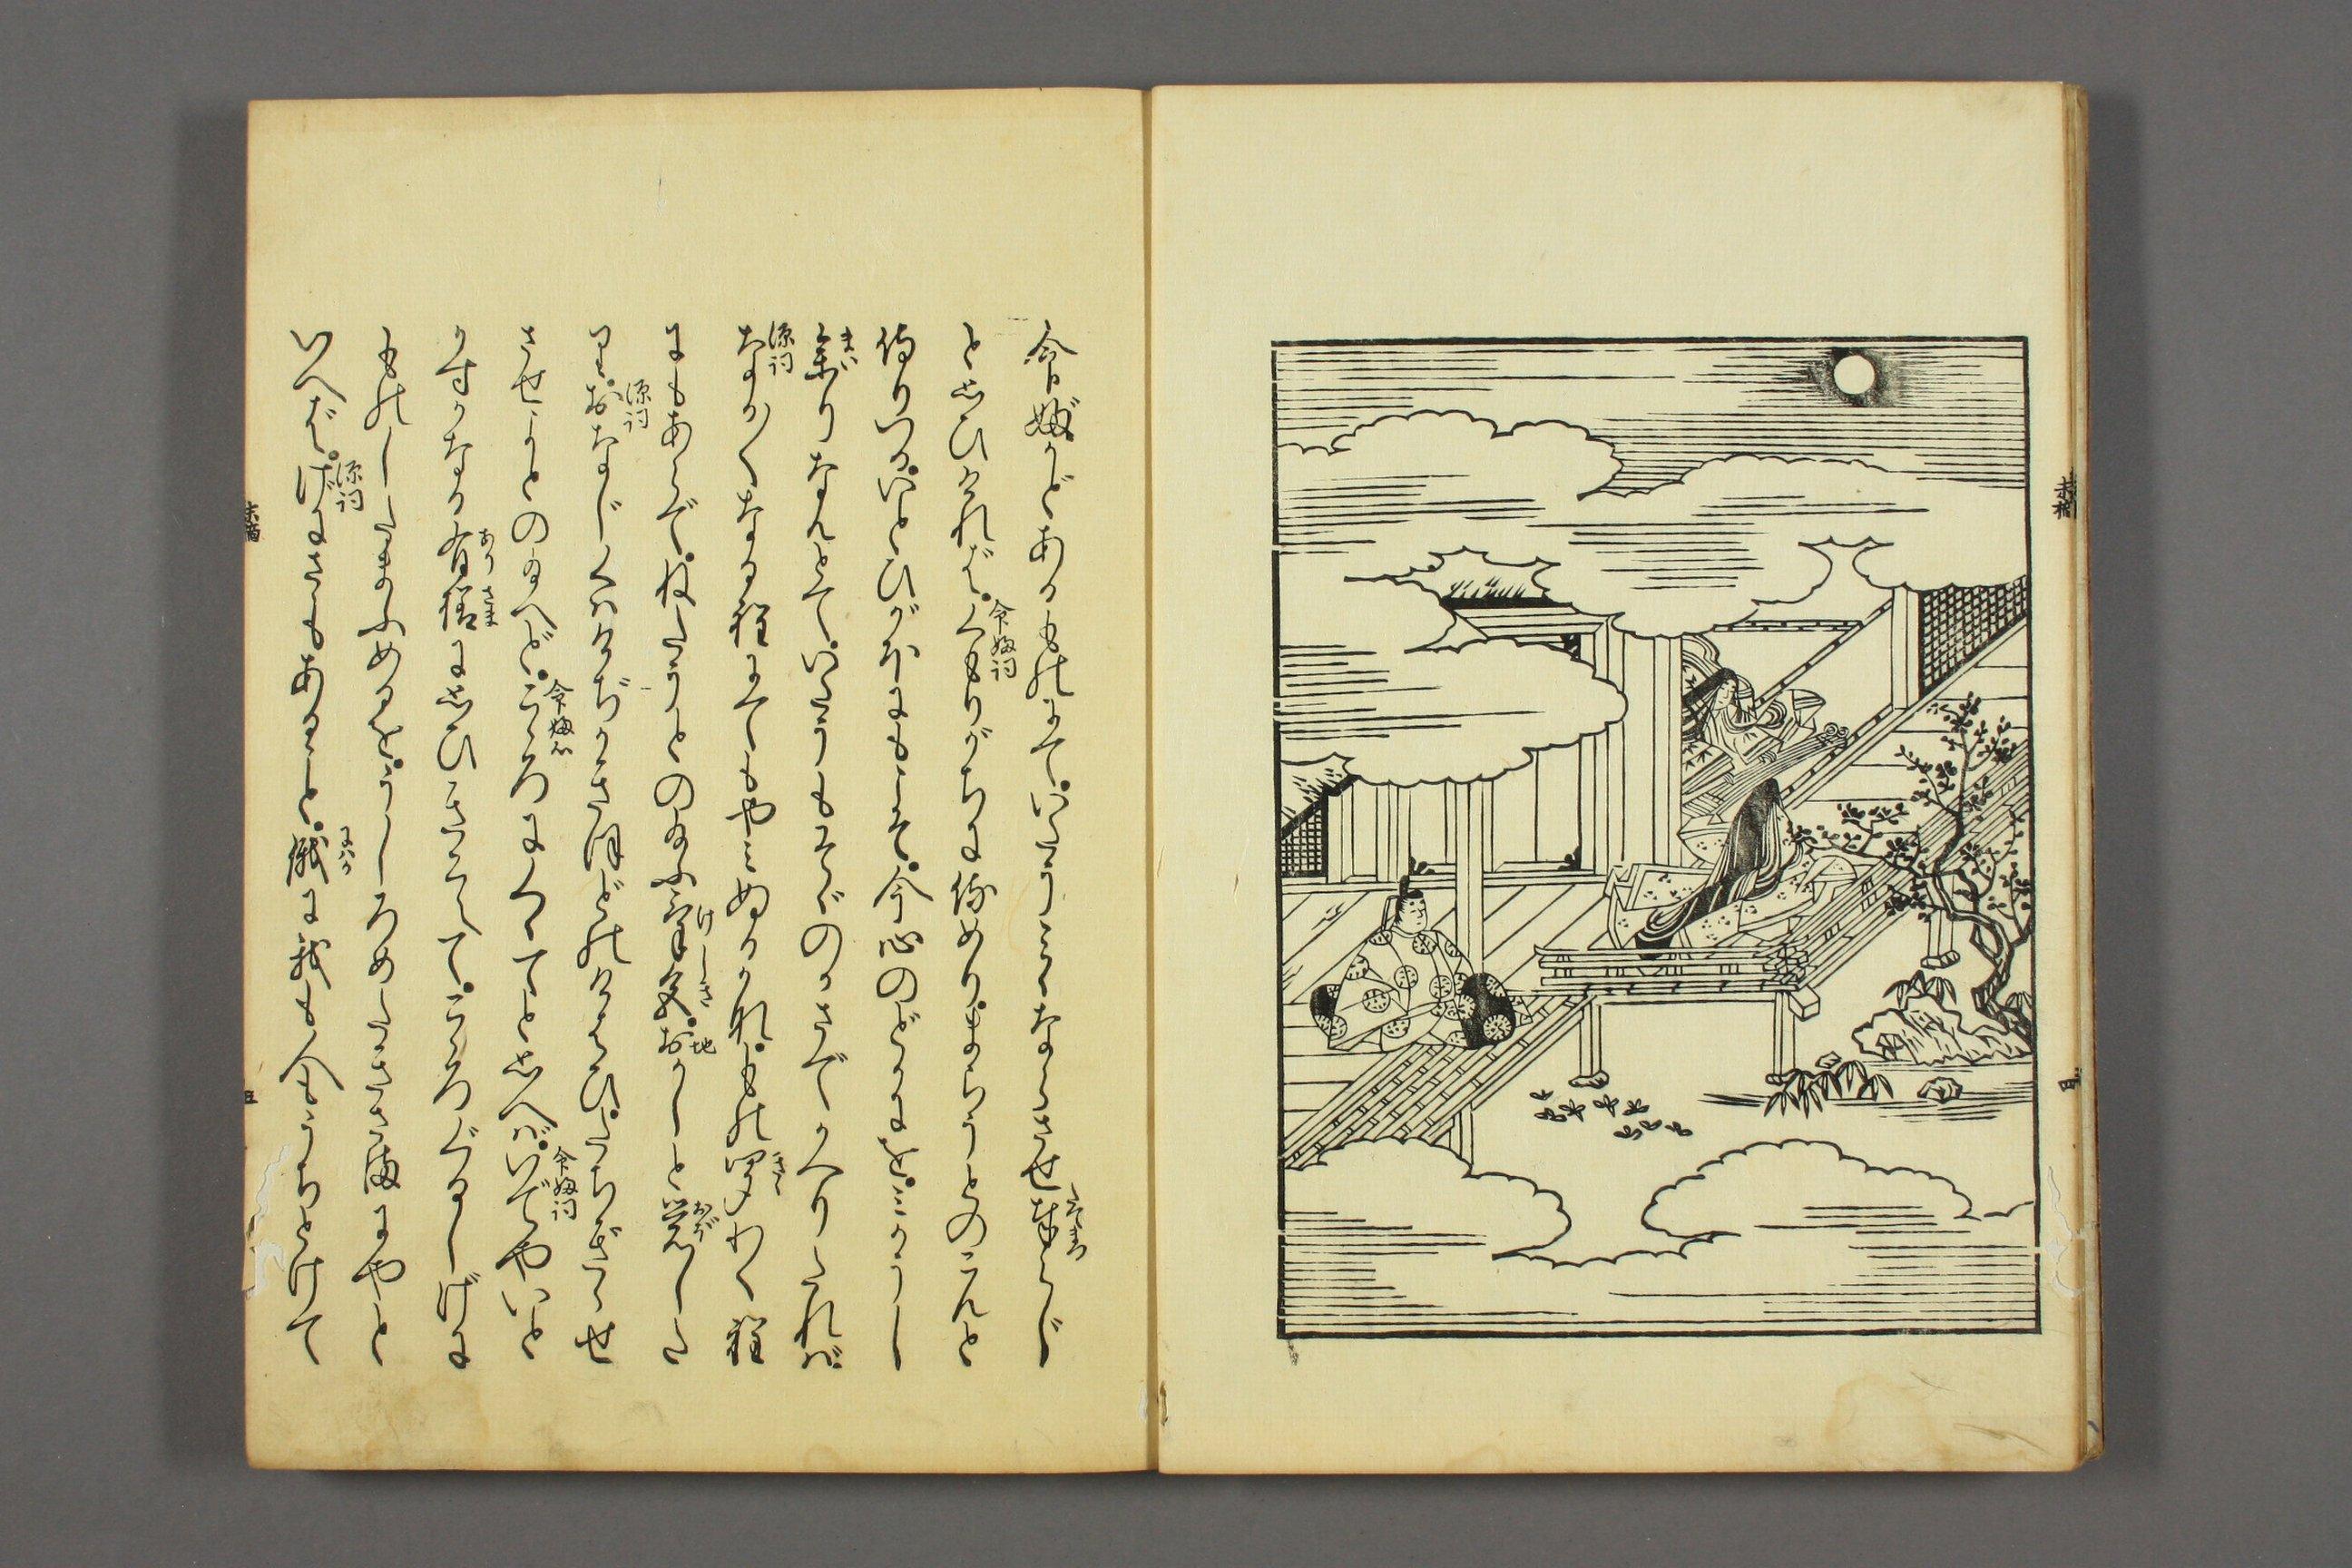 http://archive.wul.waseda.ac.jp/kosho/bunko30/bunko30_a0007/bunko30_a0007_0006/bunko30_a0007_0006_p0006.jpg